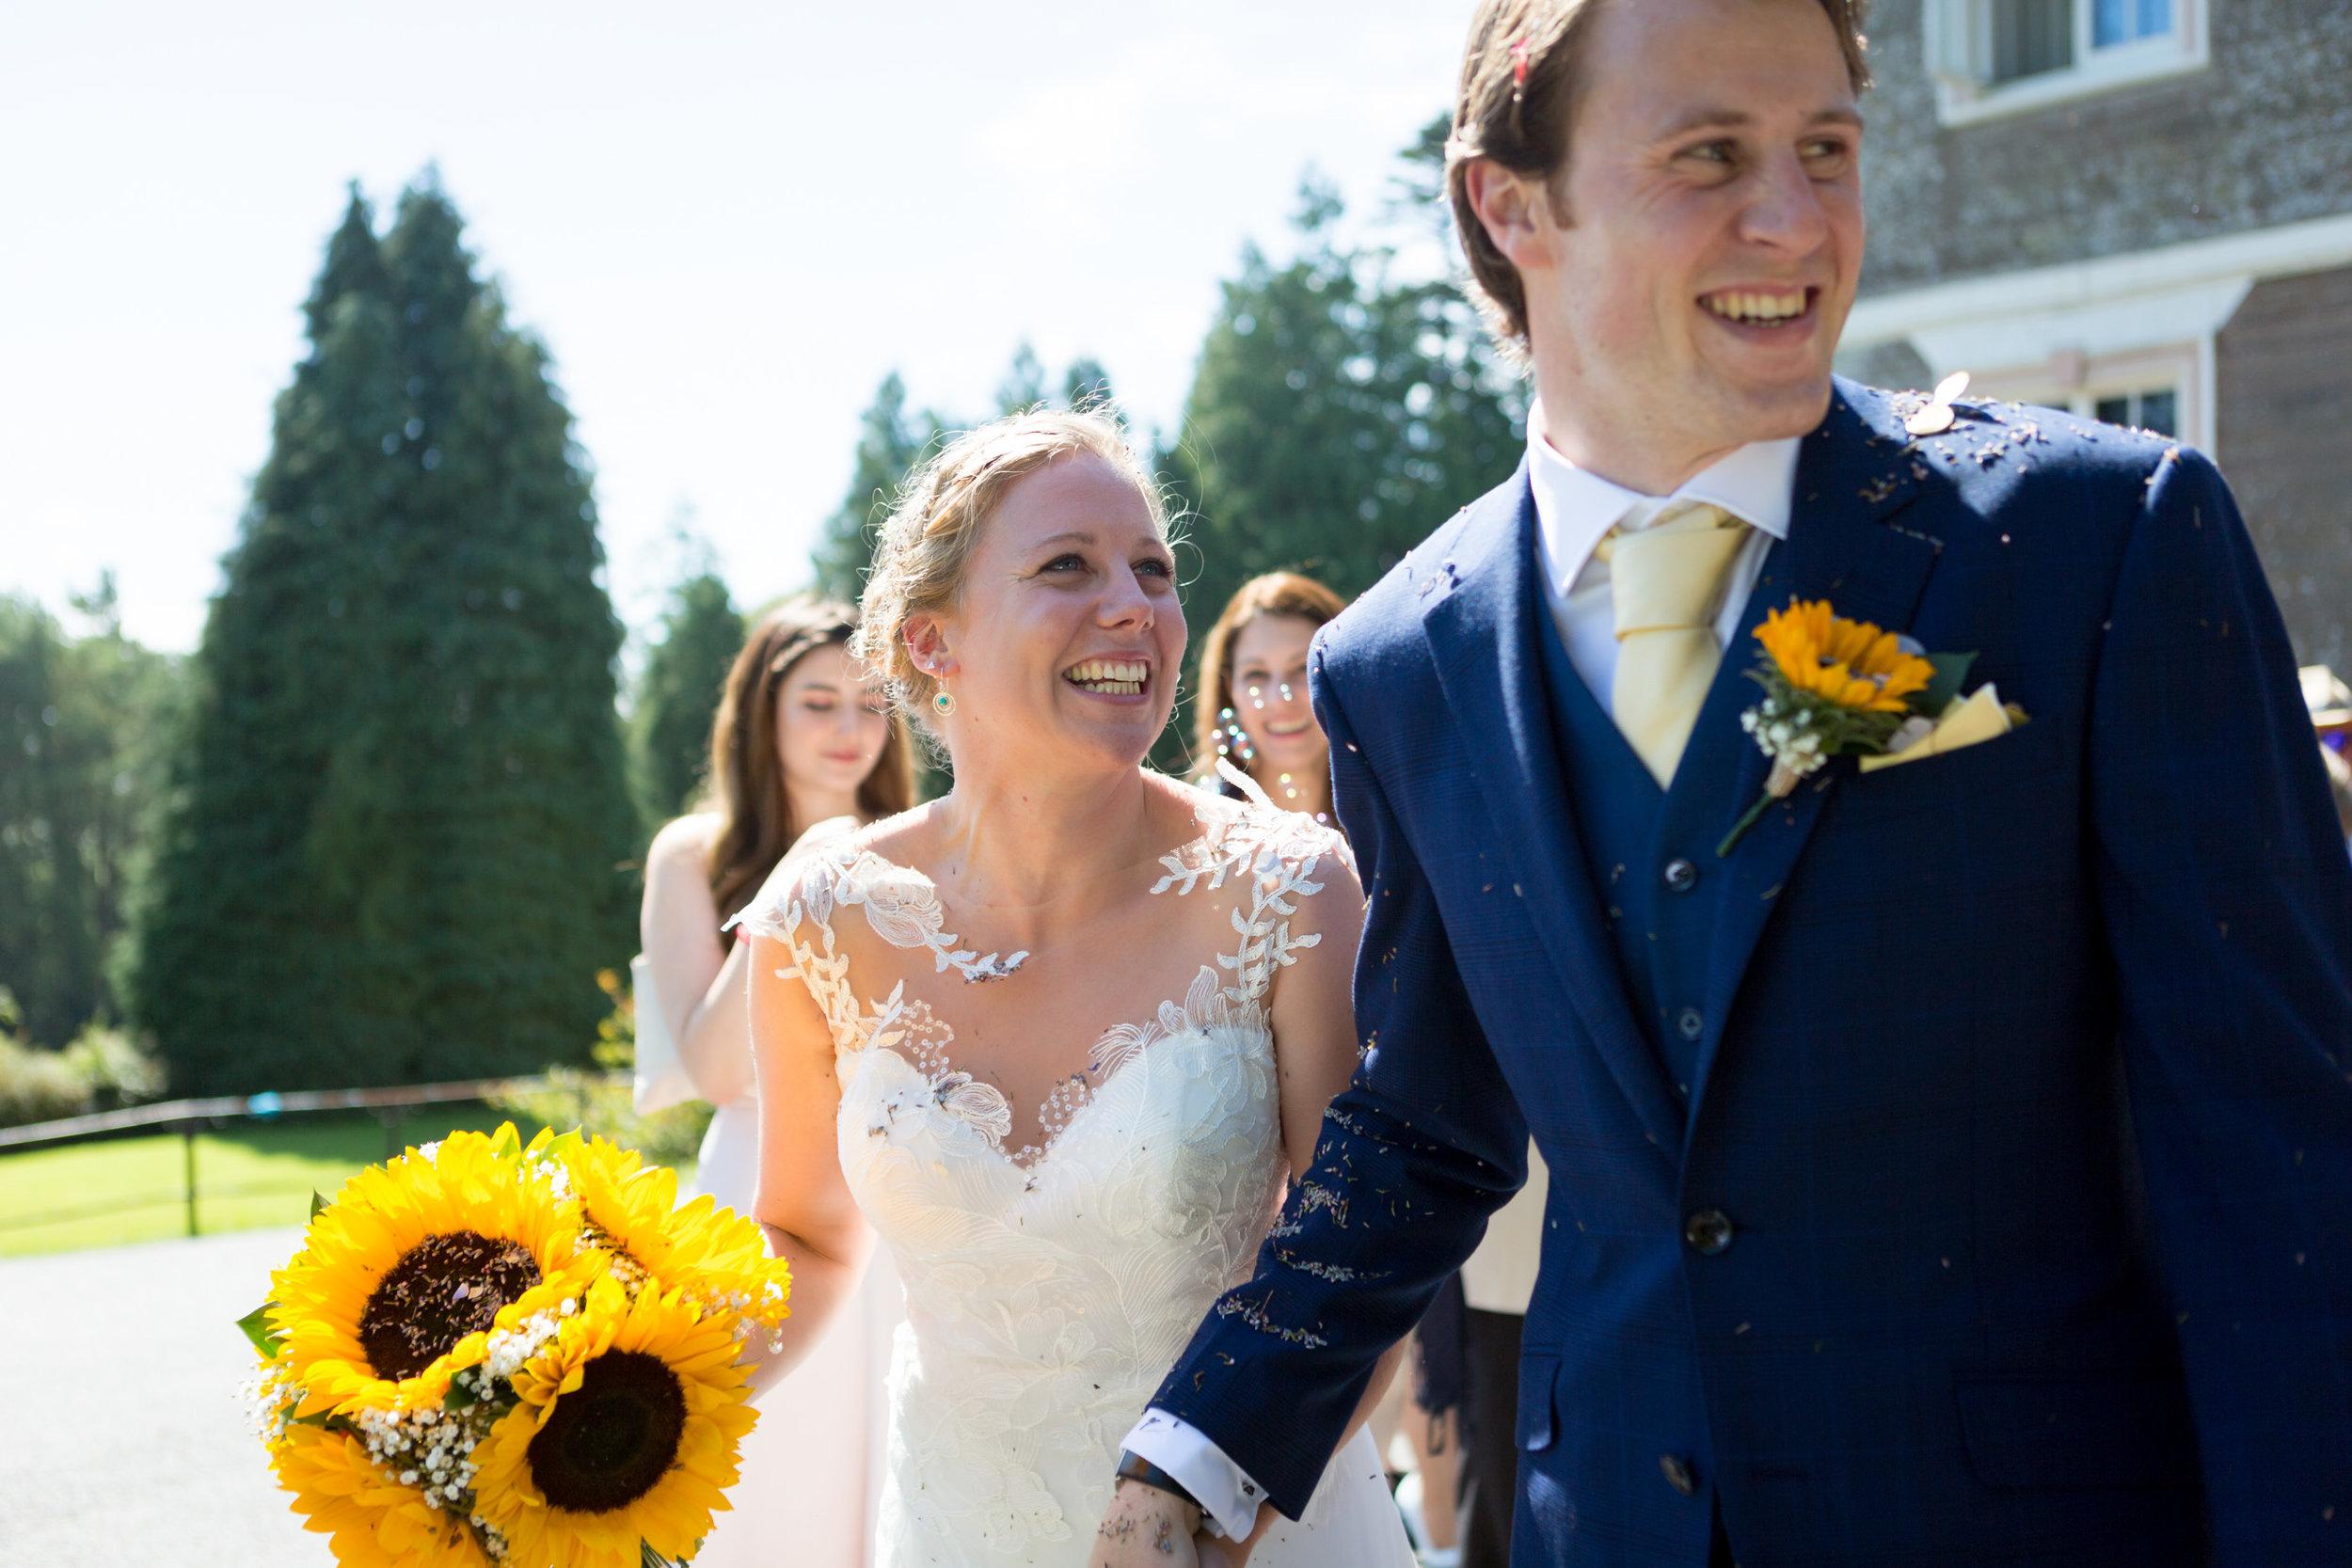 Bucklands-Tout-Saints-Hotel-Devon-Wedding-Photography-14.jpg